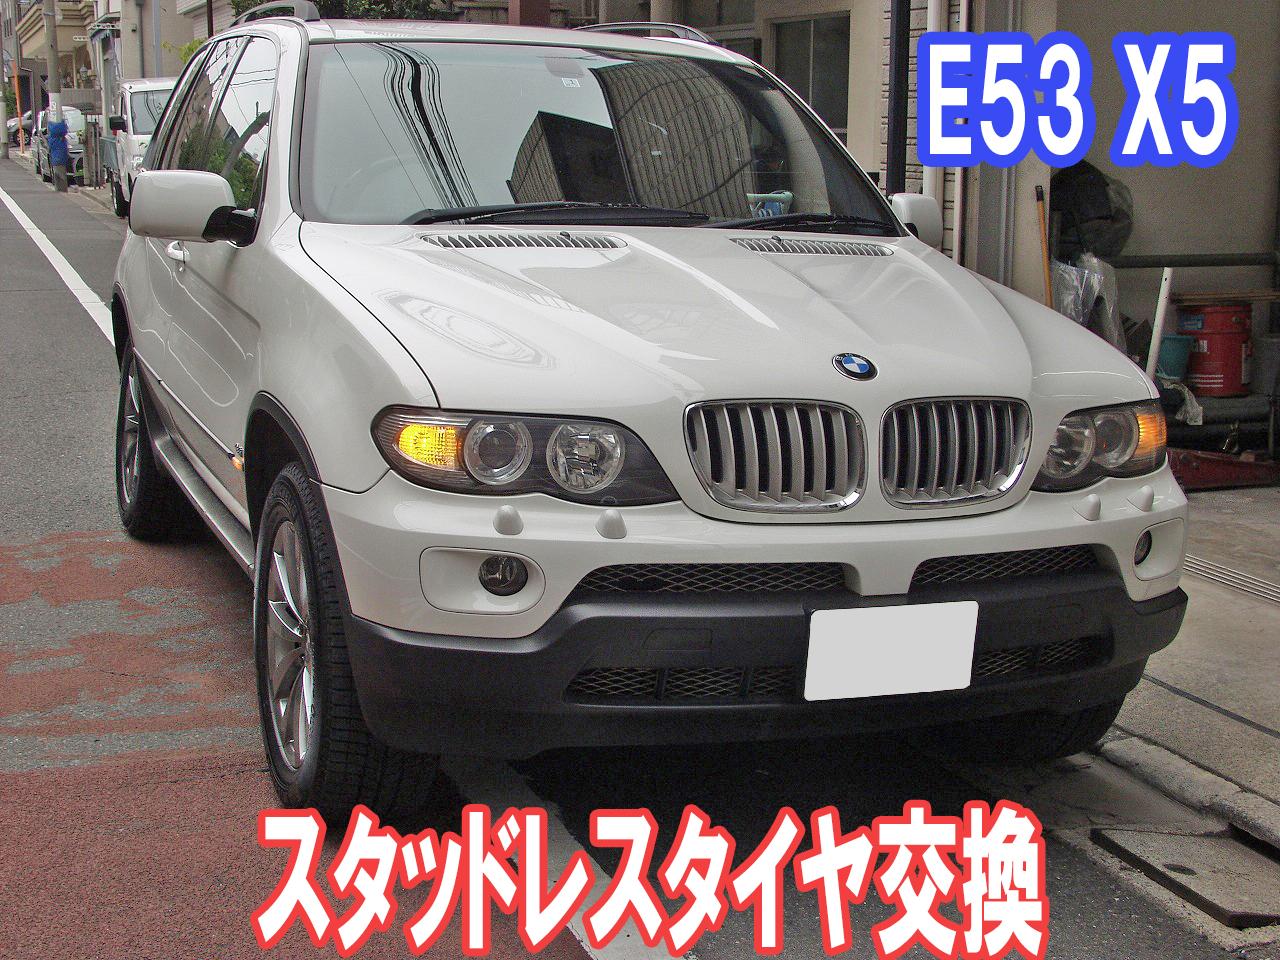 BMW E53 X5 スタッドレスタイヤ交換画像